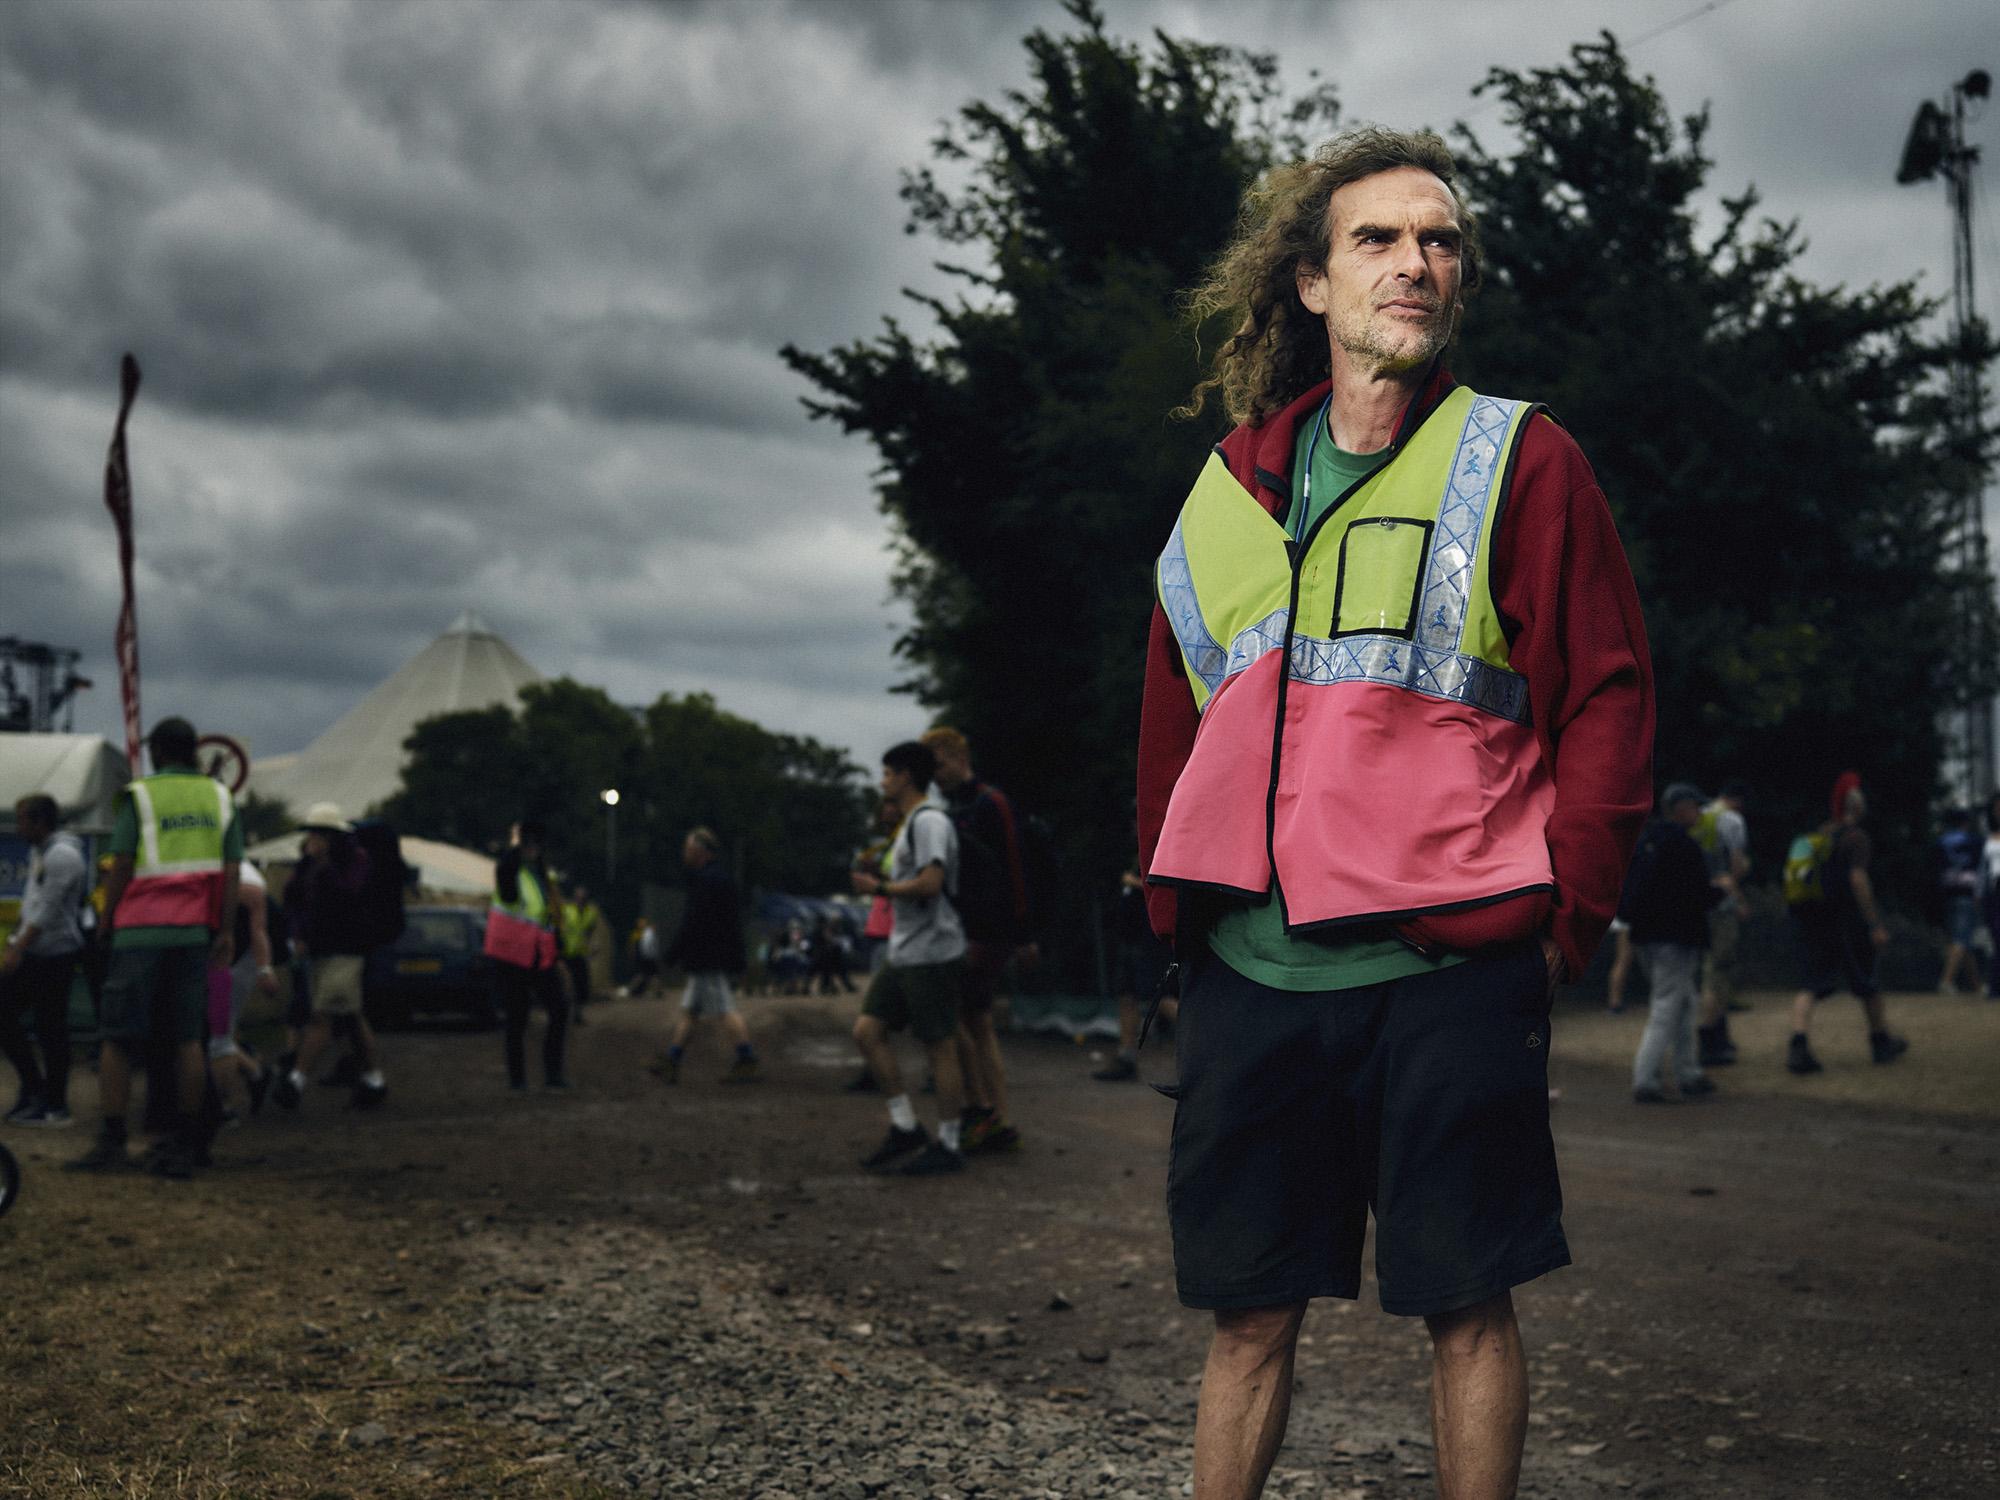 Scott - traffic steward, nomad and festival veteran